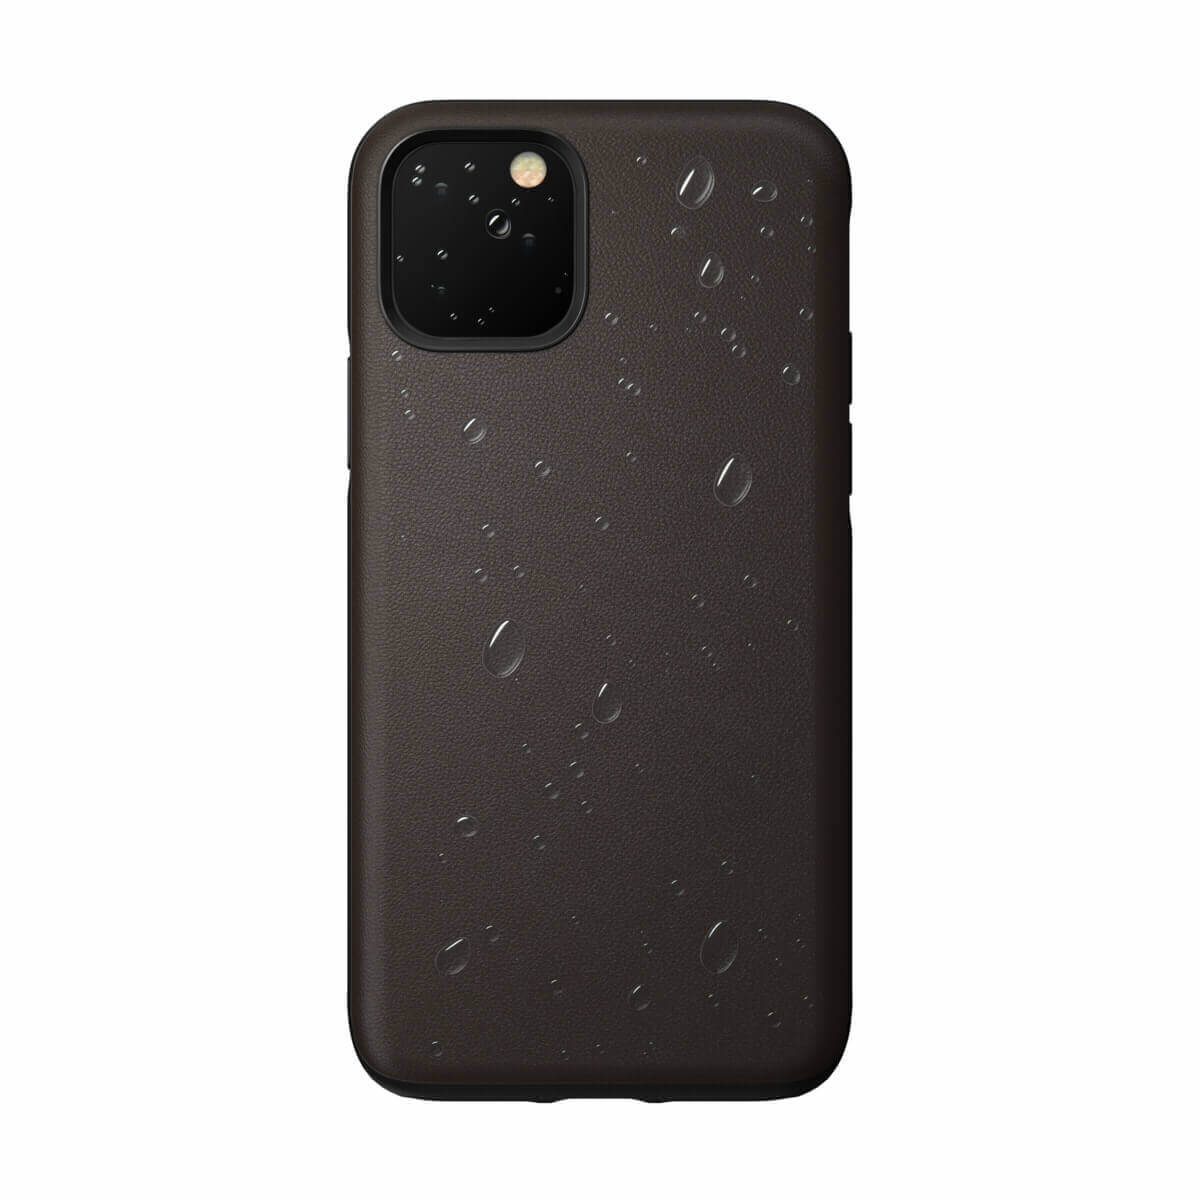 Nomad Leather Rugged Waterproof Case — кожен (естествена кожа) кейс за iPhone 11 Pro (кафяв) - 4